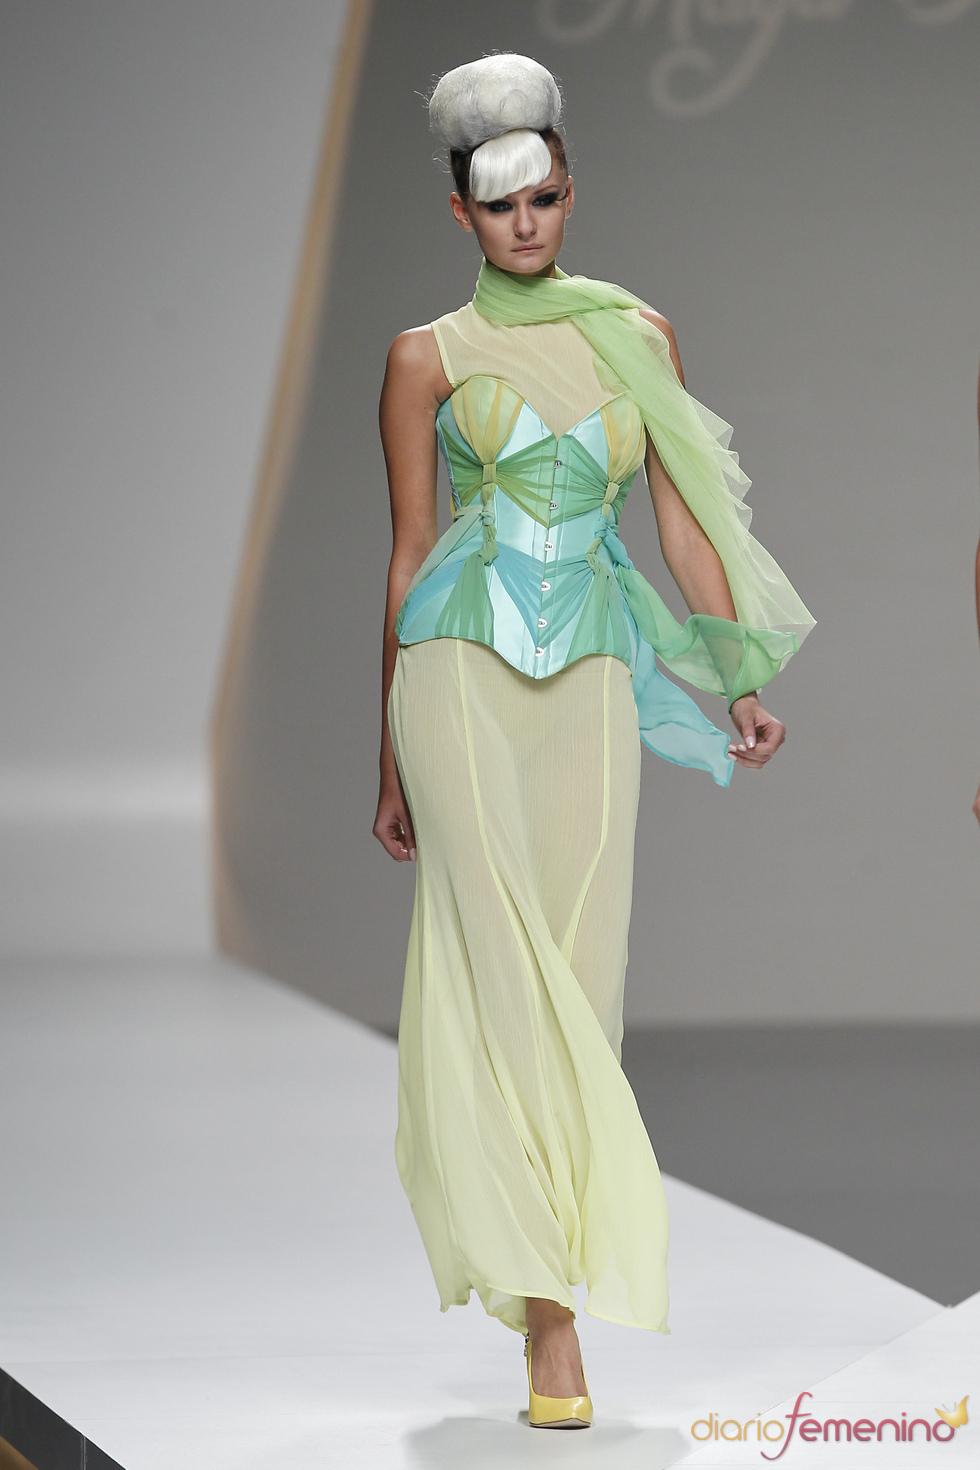 Vistoso corsé turquesa firmado por Maya Hansen en la Madrid Fashion Week